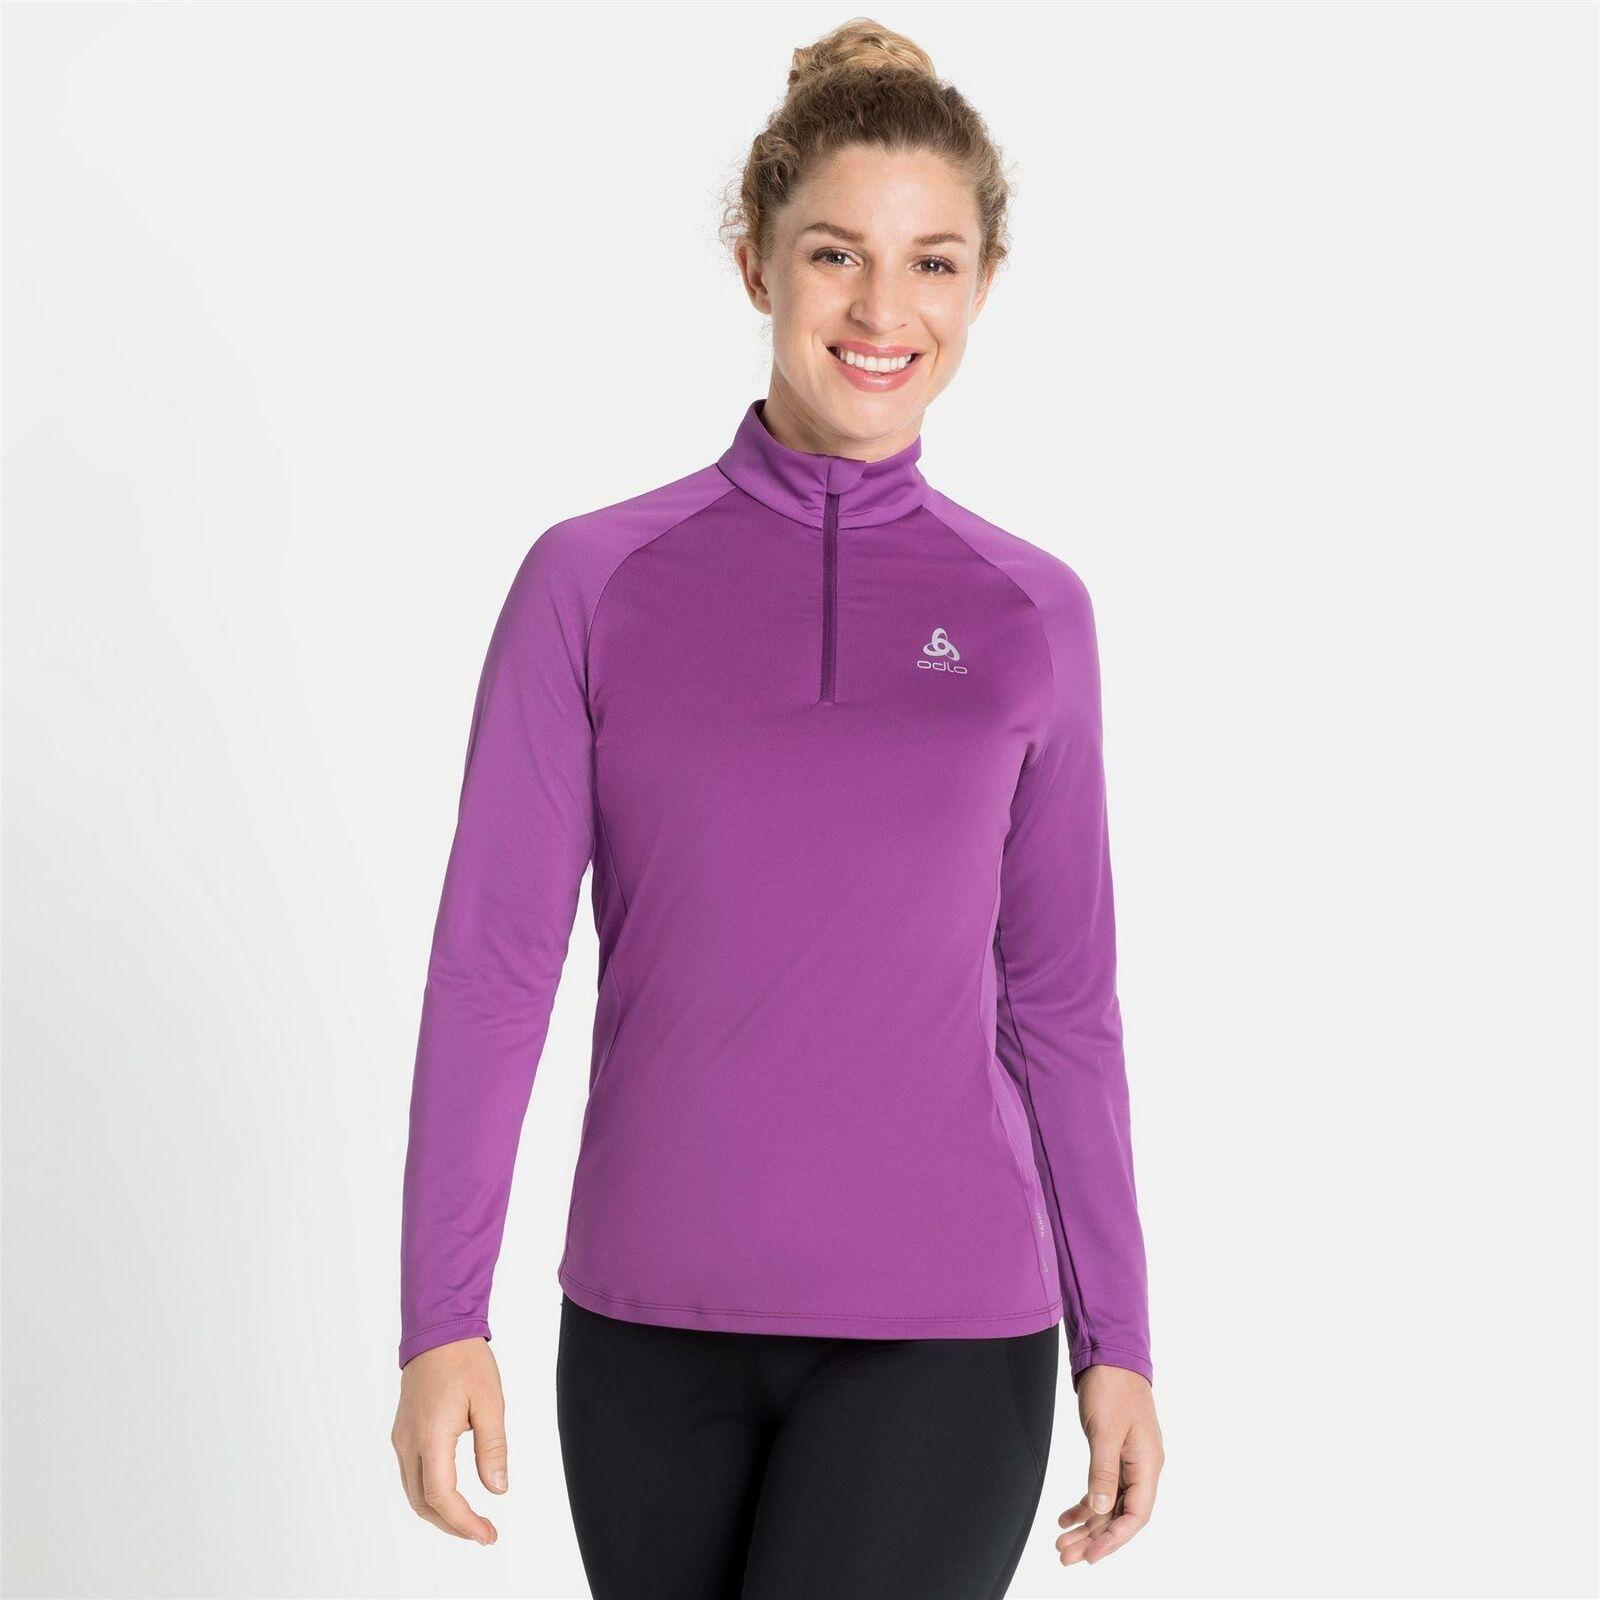 Odlo CERAMIWARM ELEMENT Half-Zip Long Sleeve Womens Running Midlayer Top *SALE*